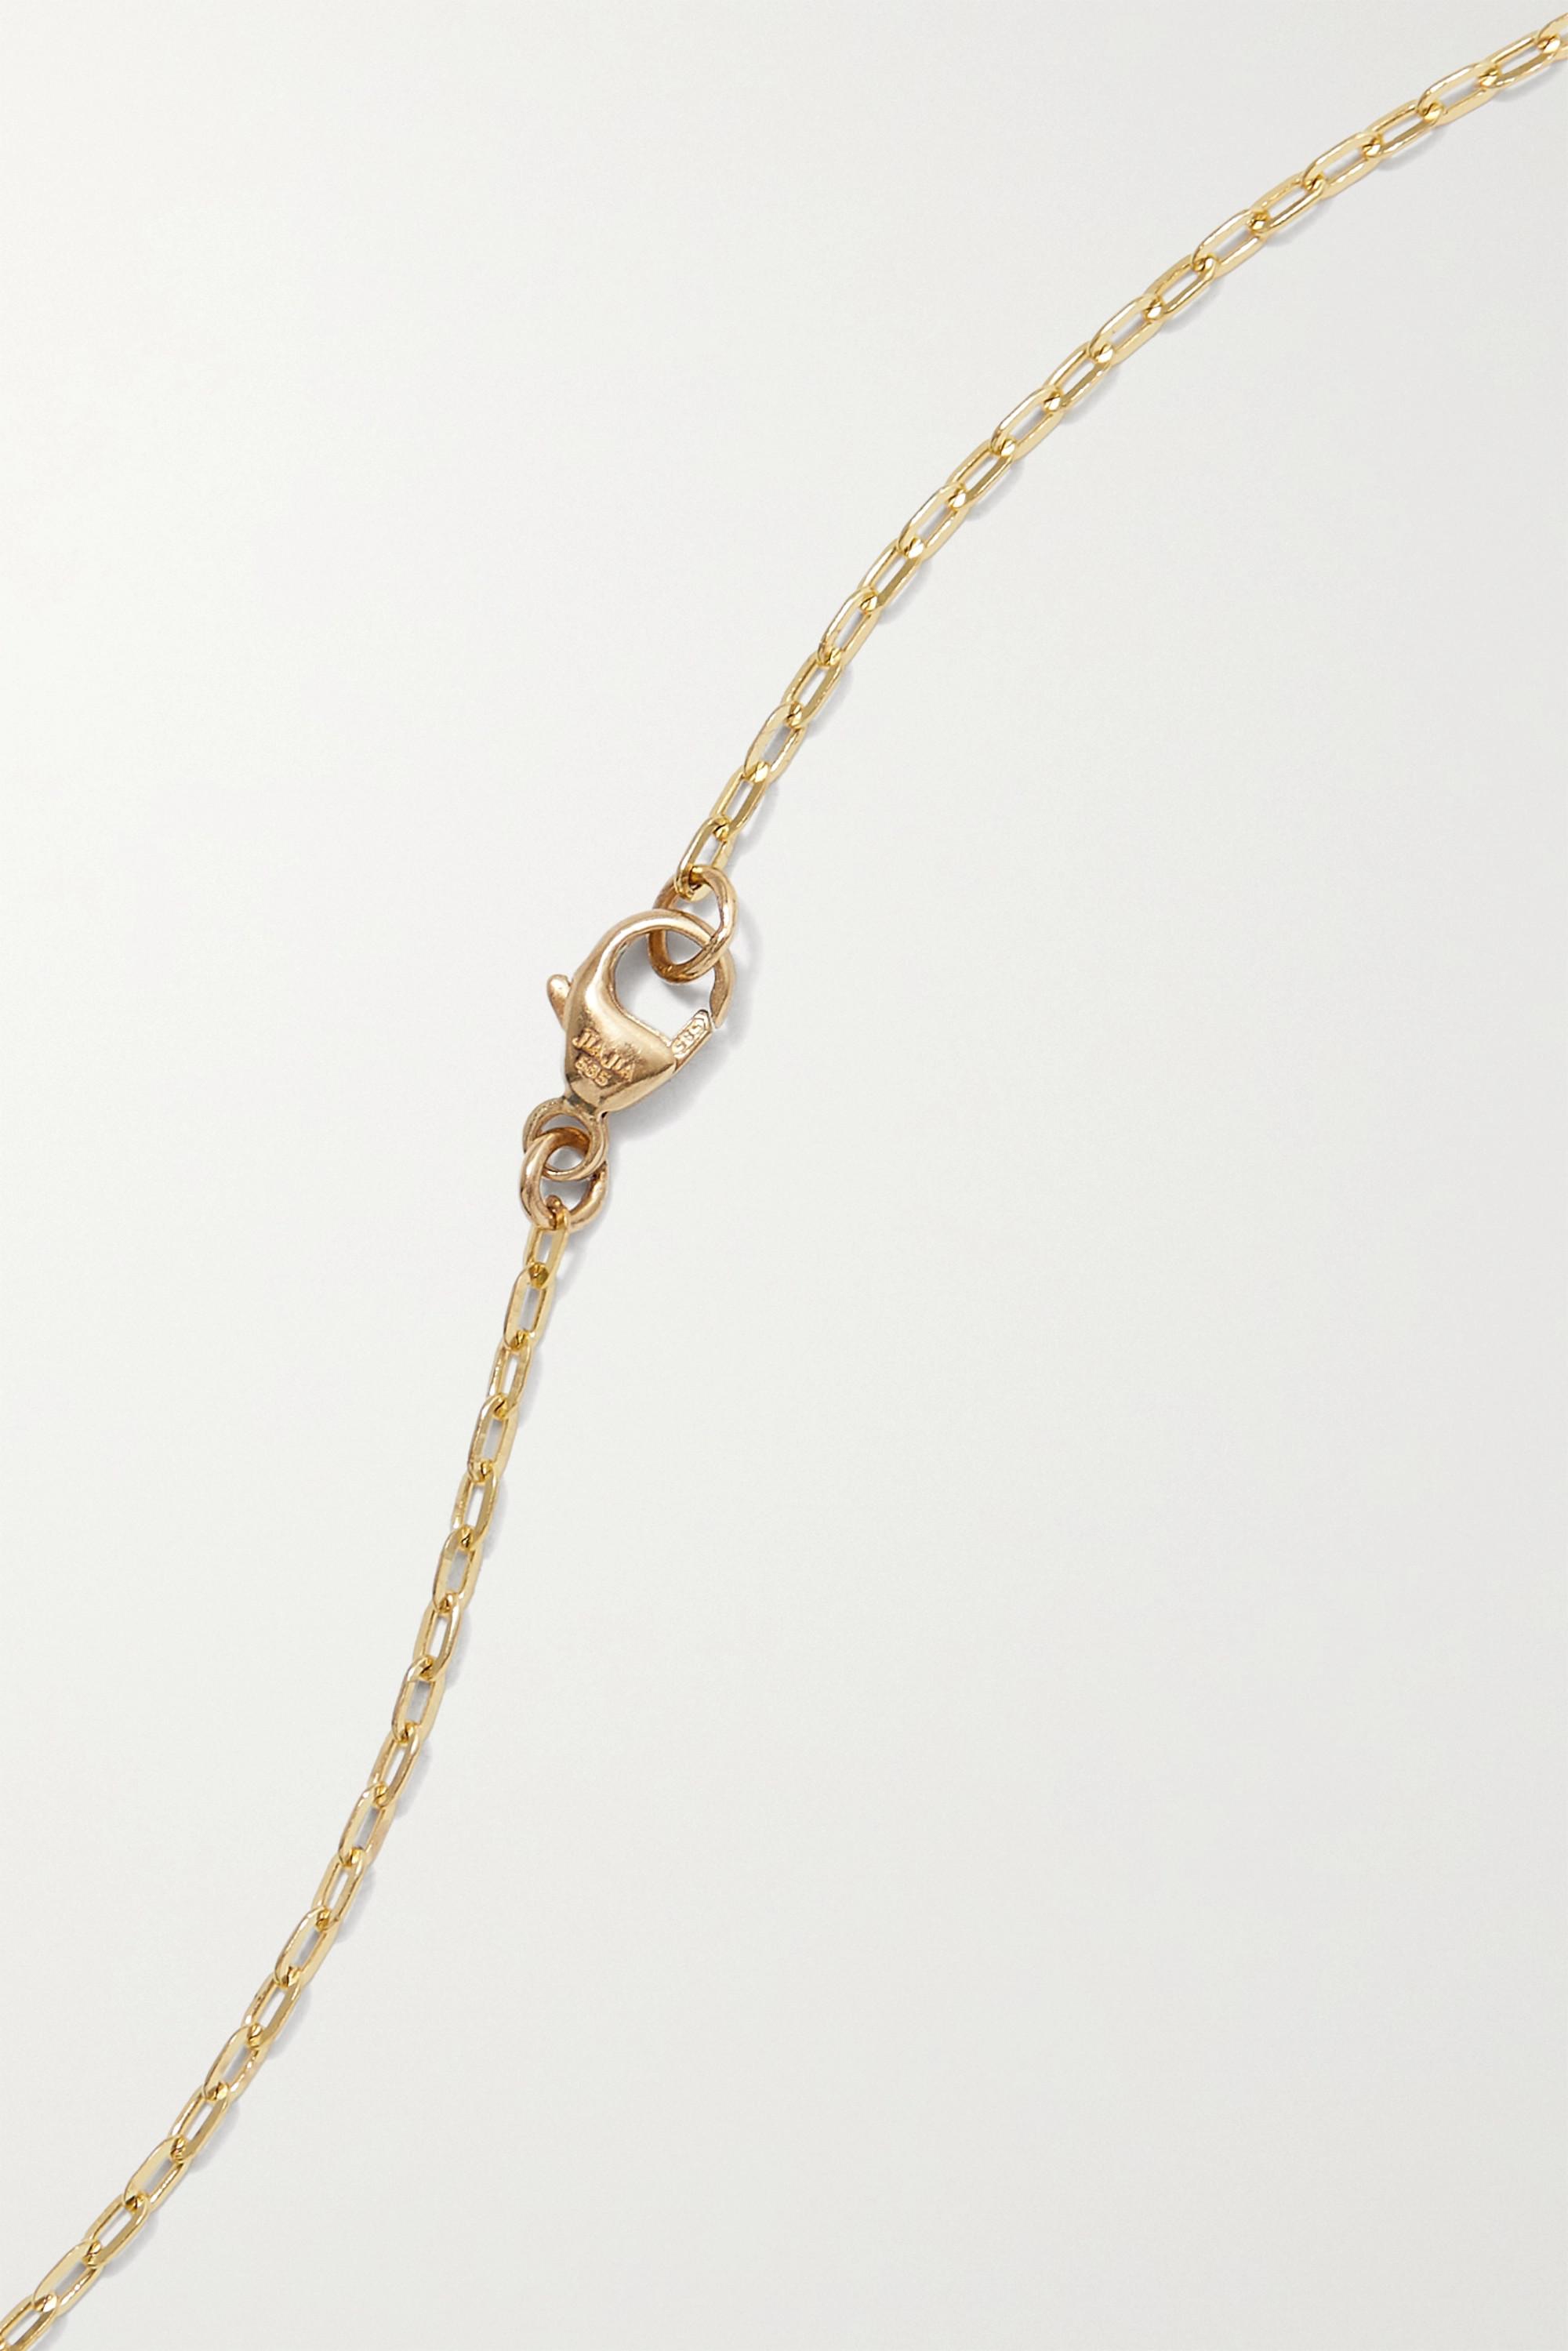 JIA JIA Kette aus 14 Karat Gold mit Quarz